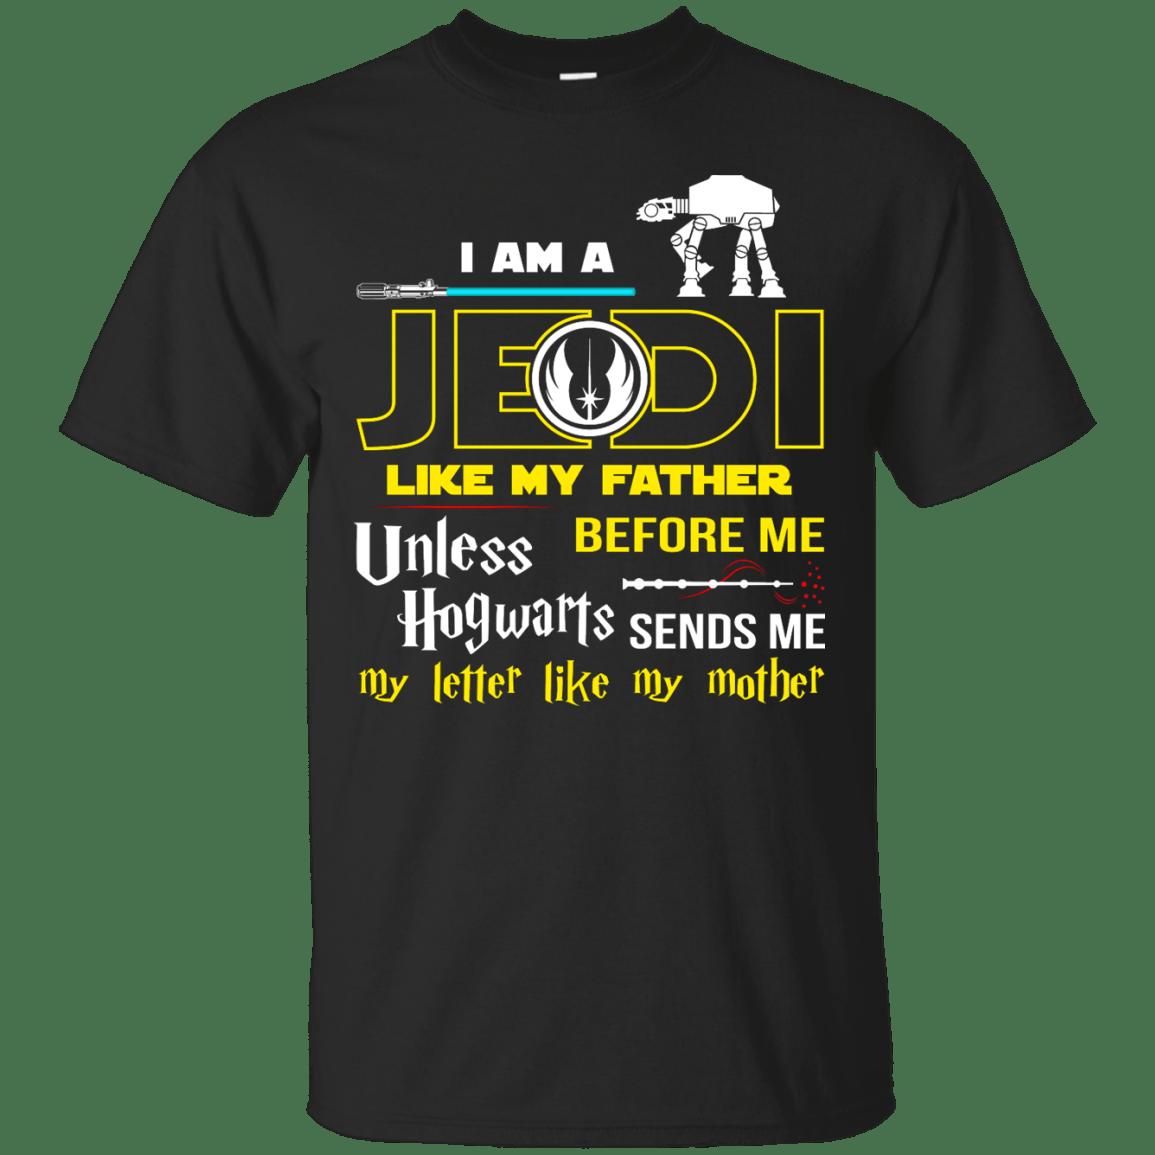 Jedi Father Hogwarts Mother Shirts